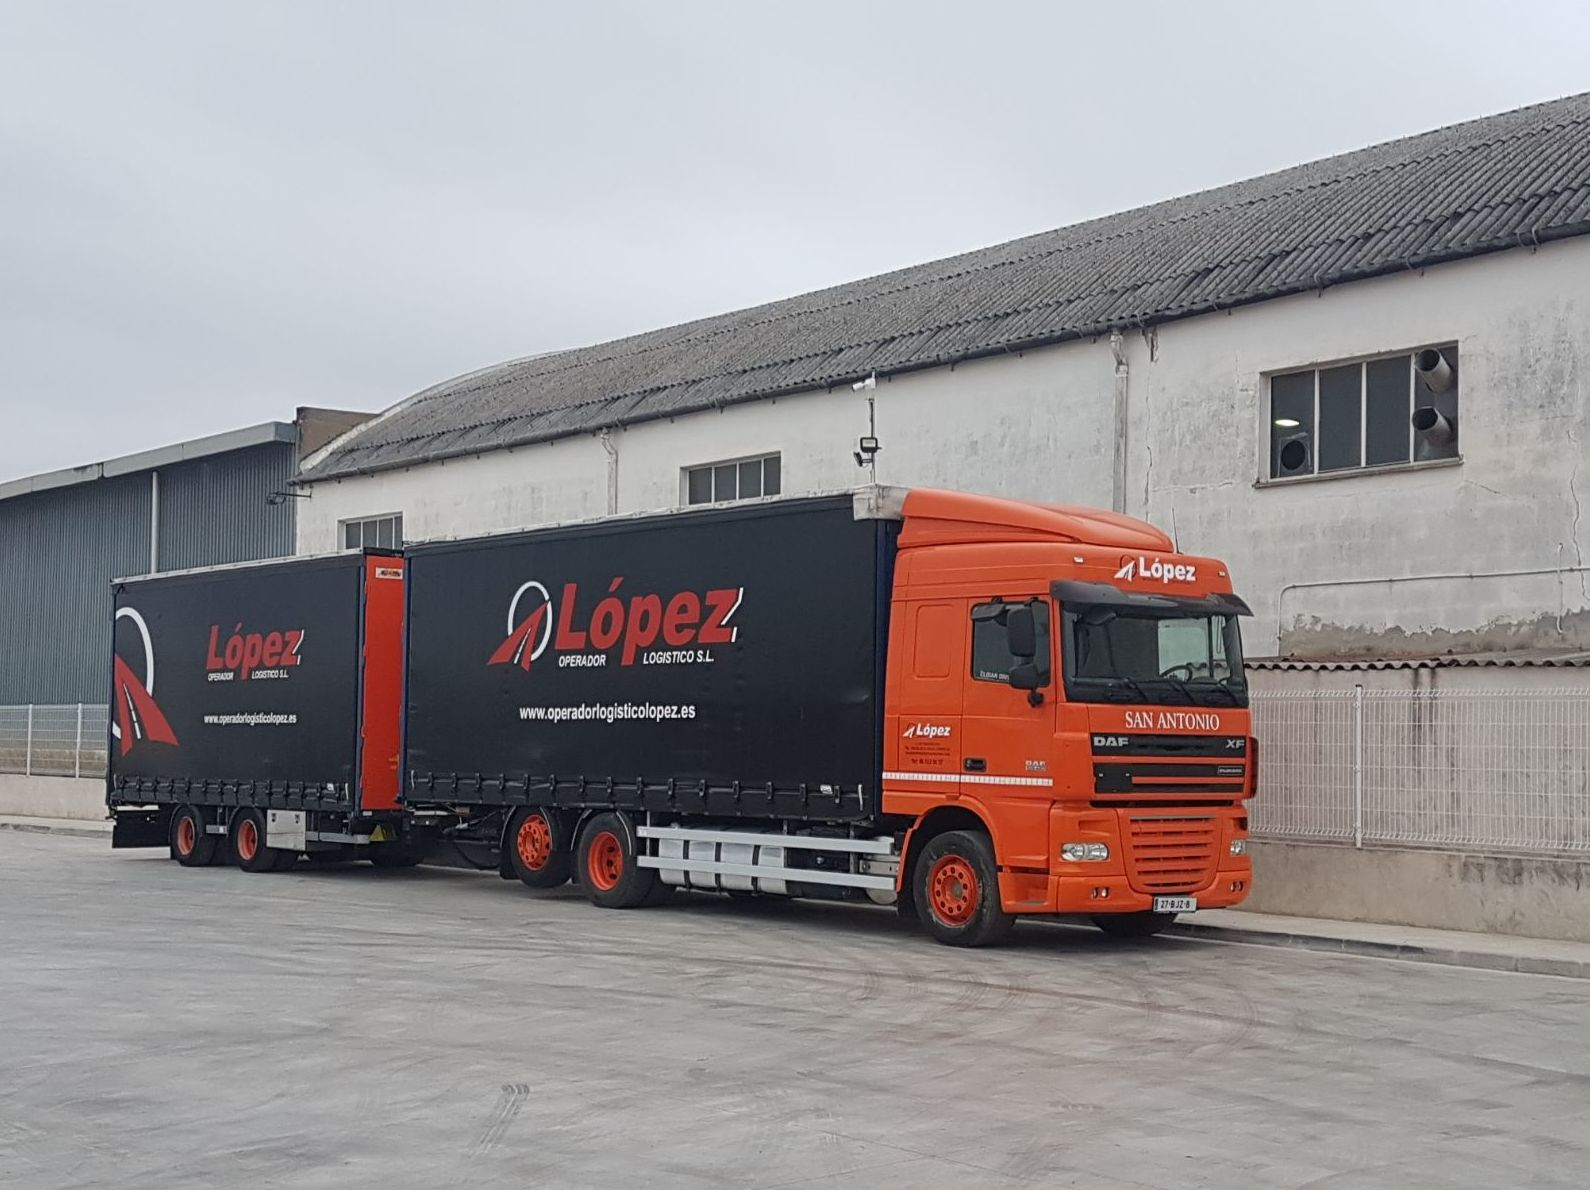 Foto 12 de Transportes de mercancía por grupaje o cargas completas en 46950 Xirivella | Transportes López